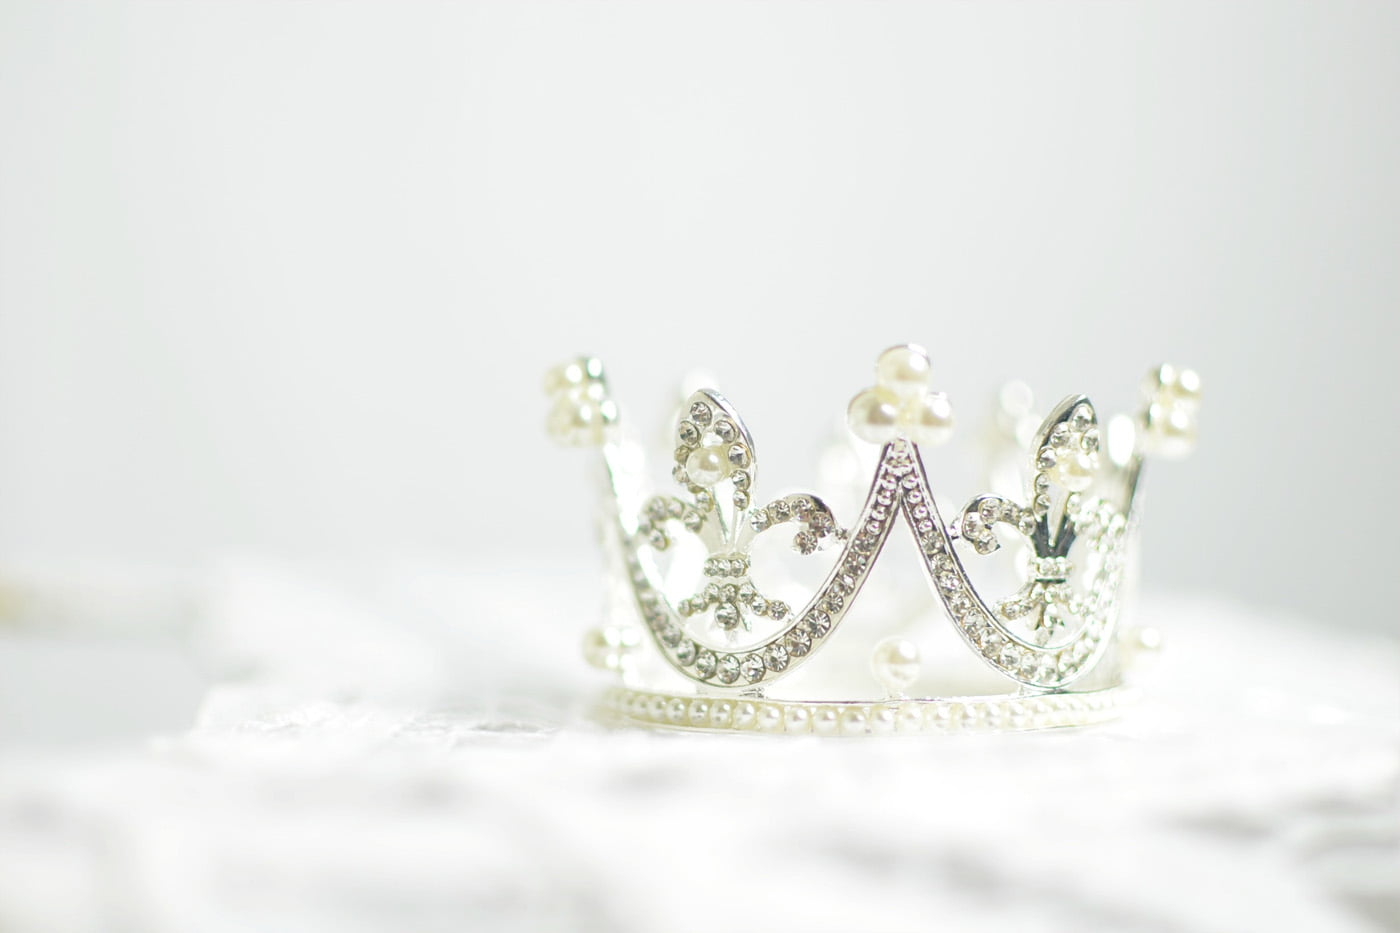 PSA: Disneyland is Hiring New Princes and Princesses!